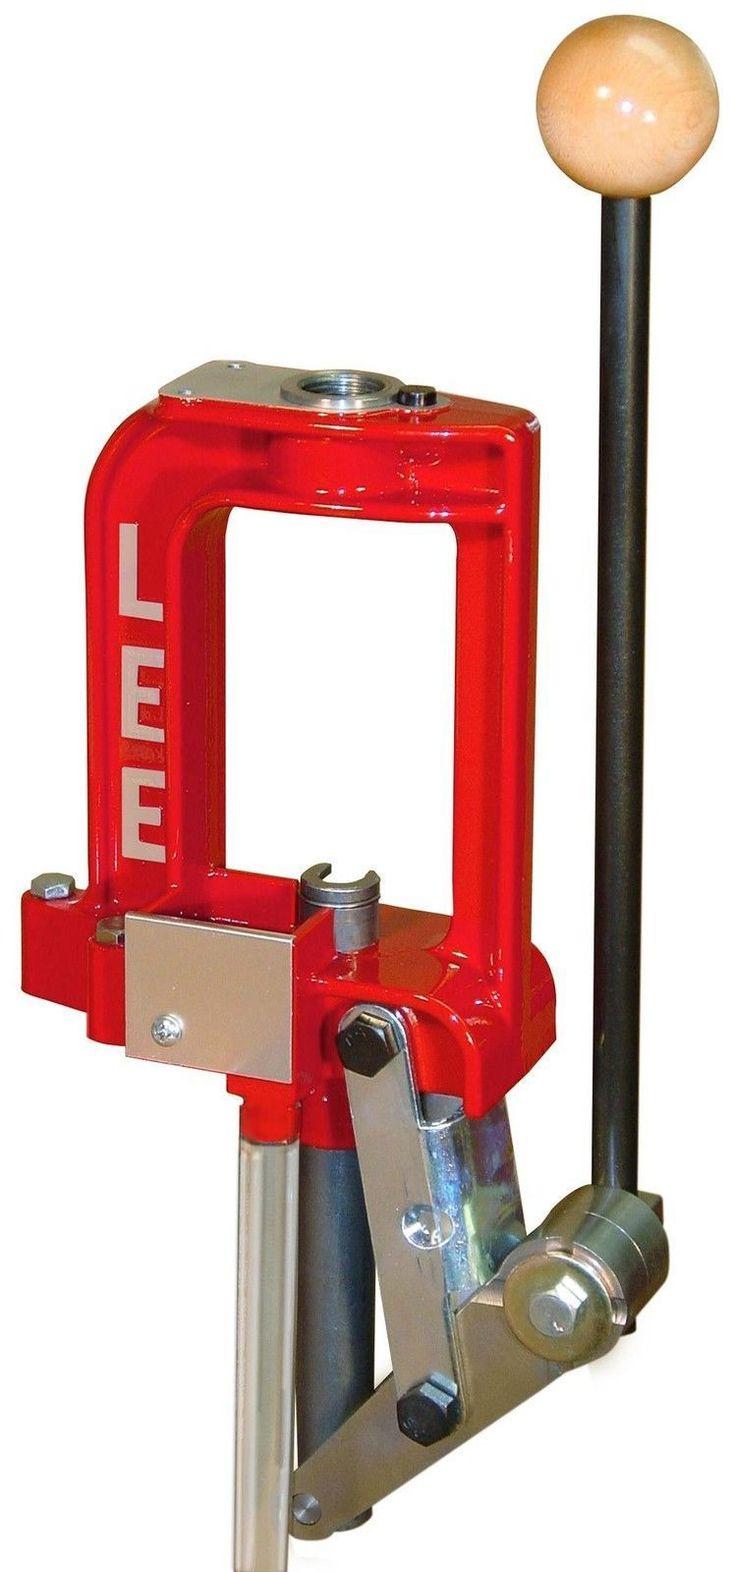 Lee Breech Lock Challenger Reloading Press Lee 90588 NEW SINGLE STAGE RELOADER